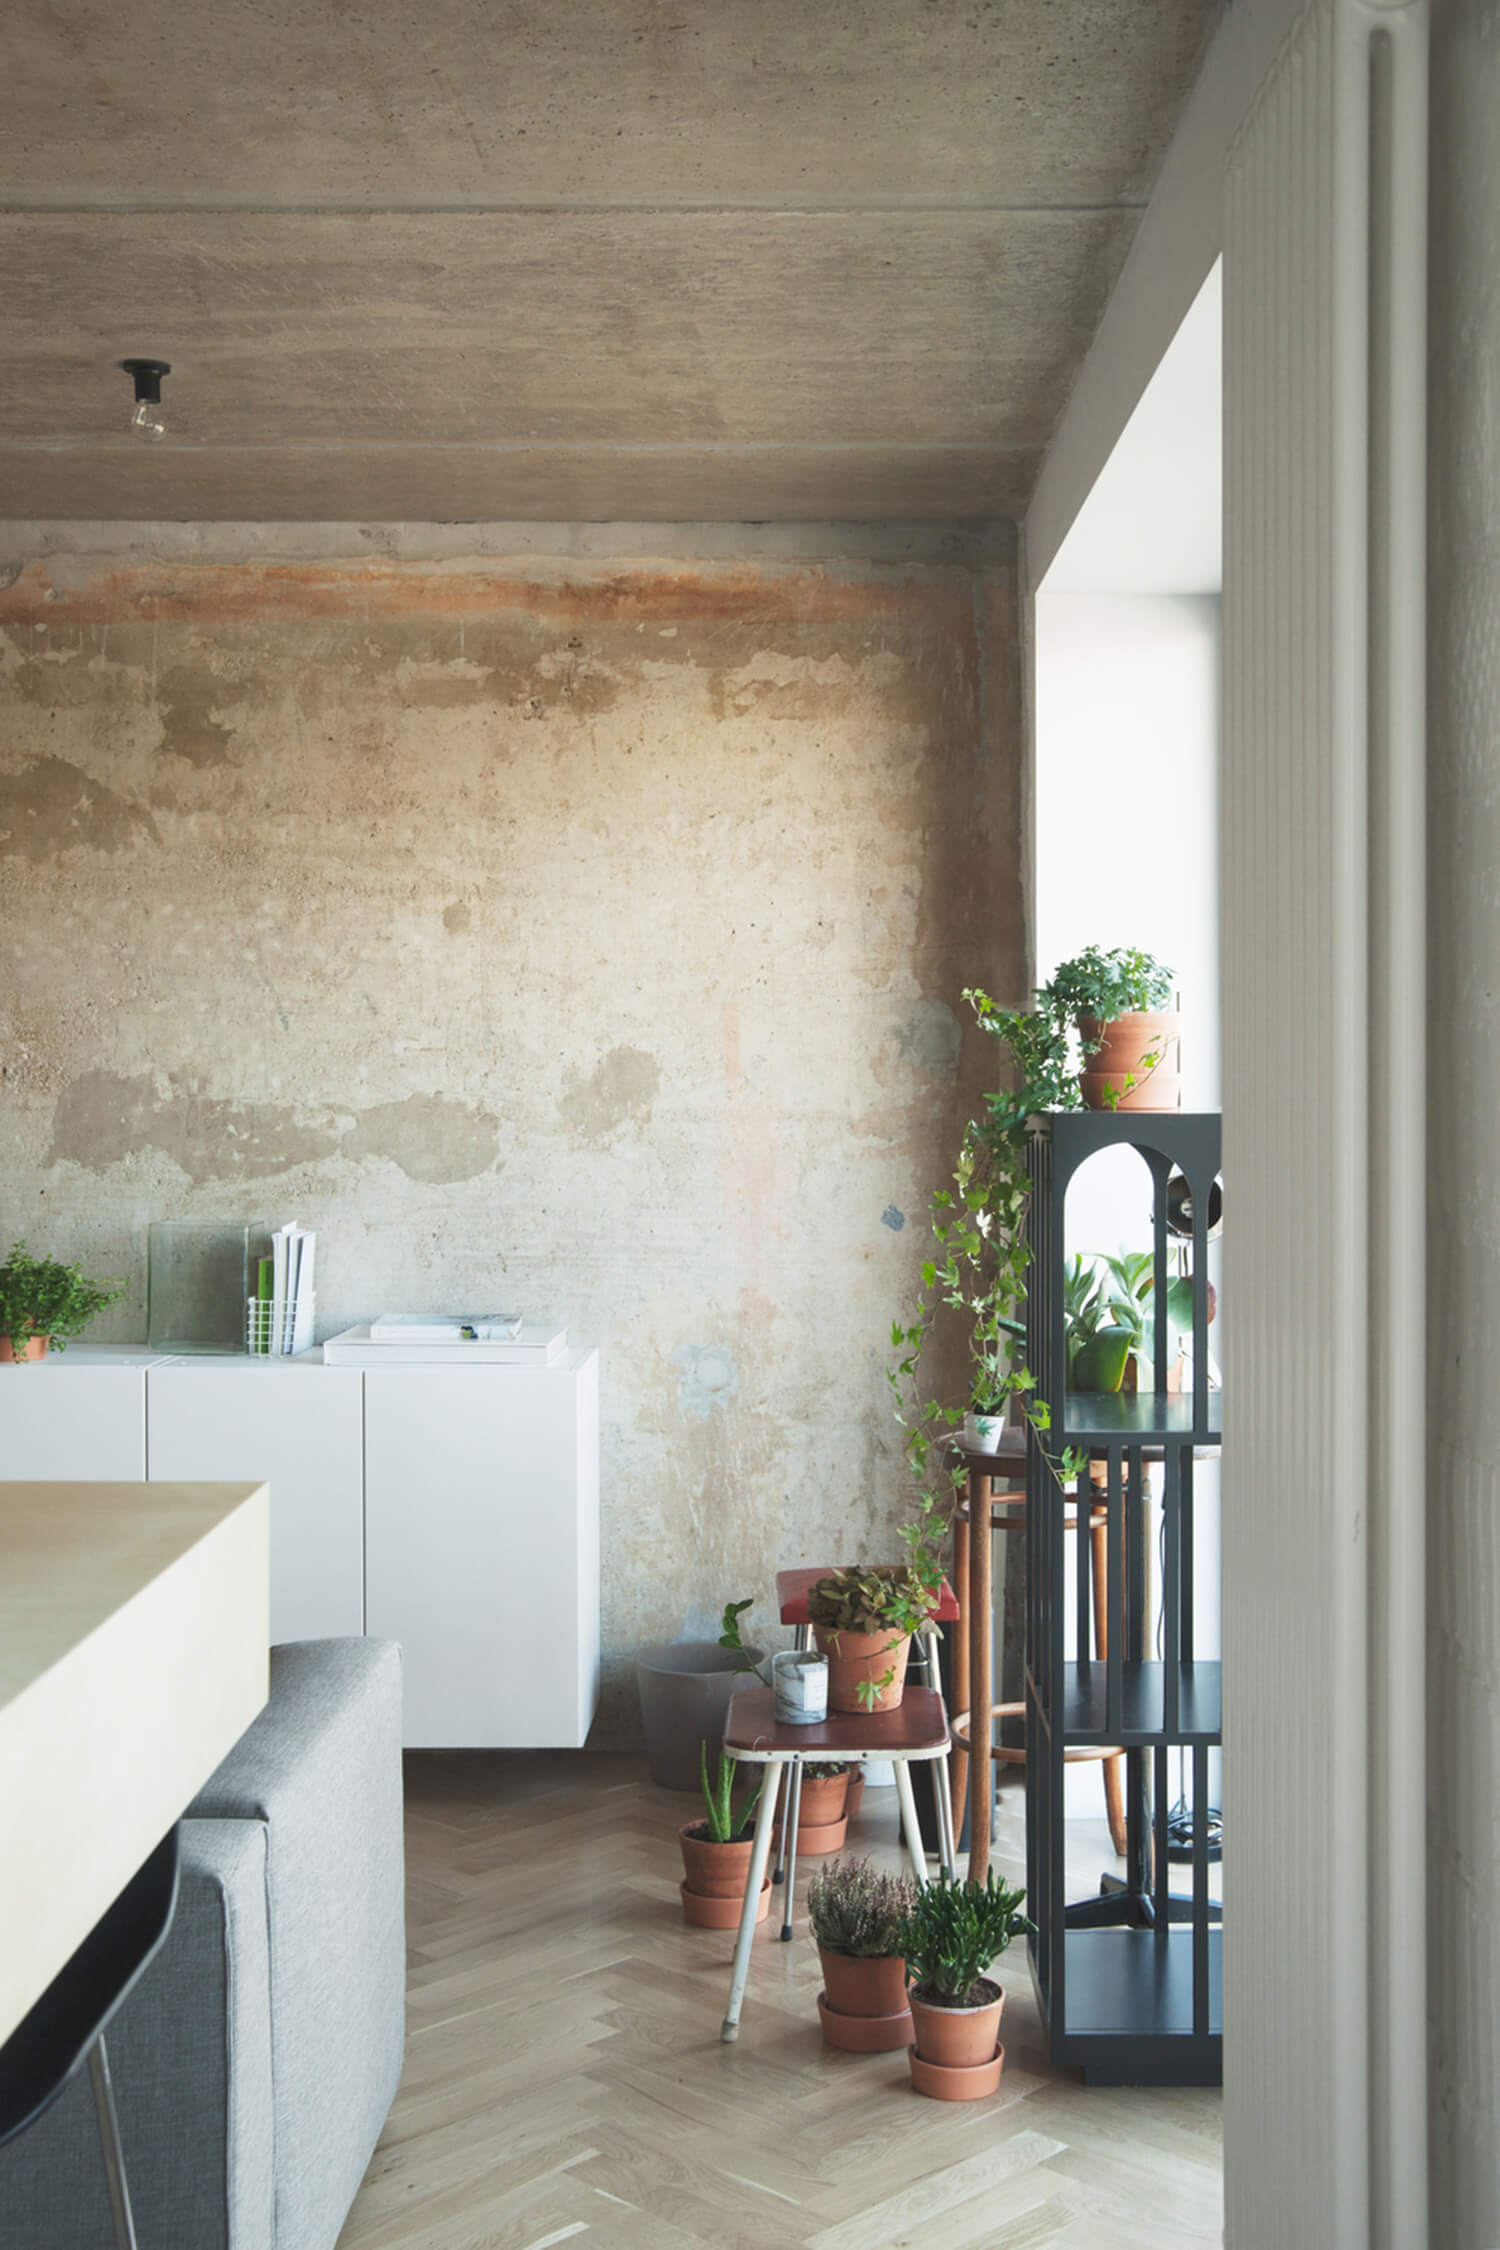 est living concrete ceiling apartment crosby studios.13